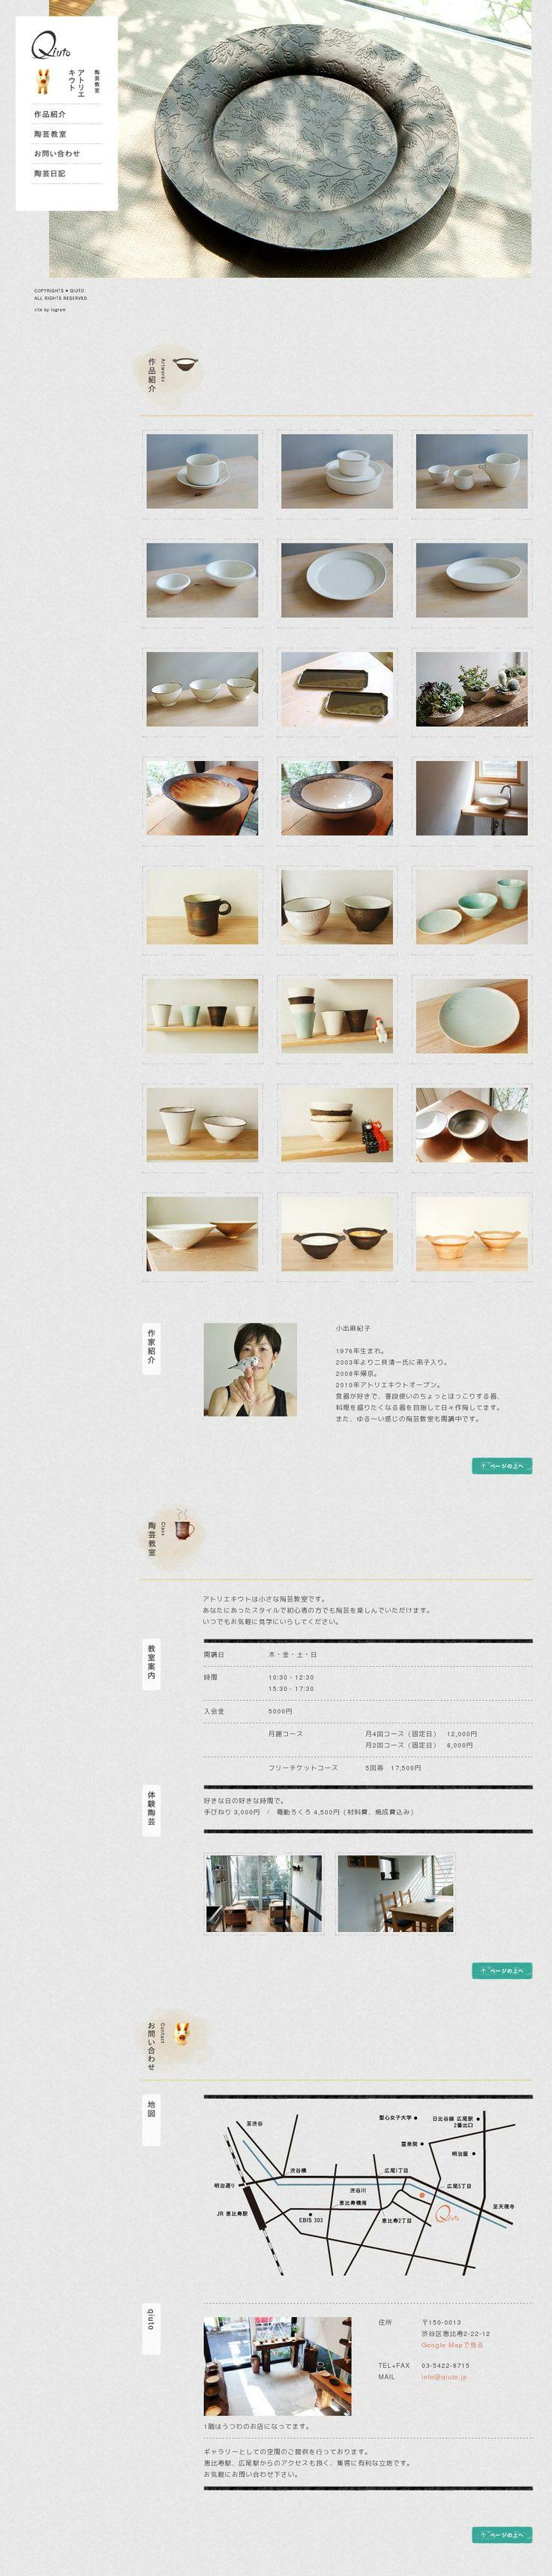 The website 'http://qiuto.jp/' courtesy of @Pinstamatic (http://pinstamatic.com)